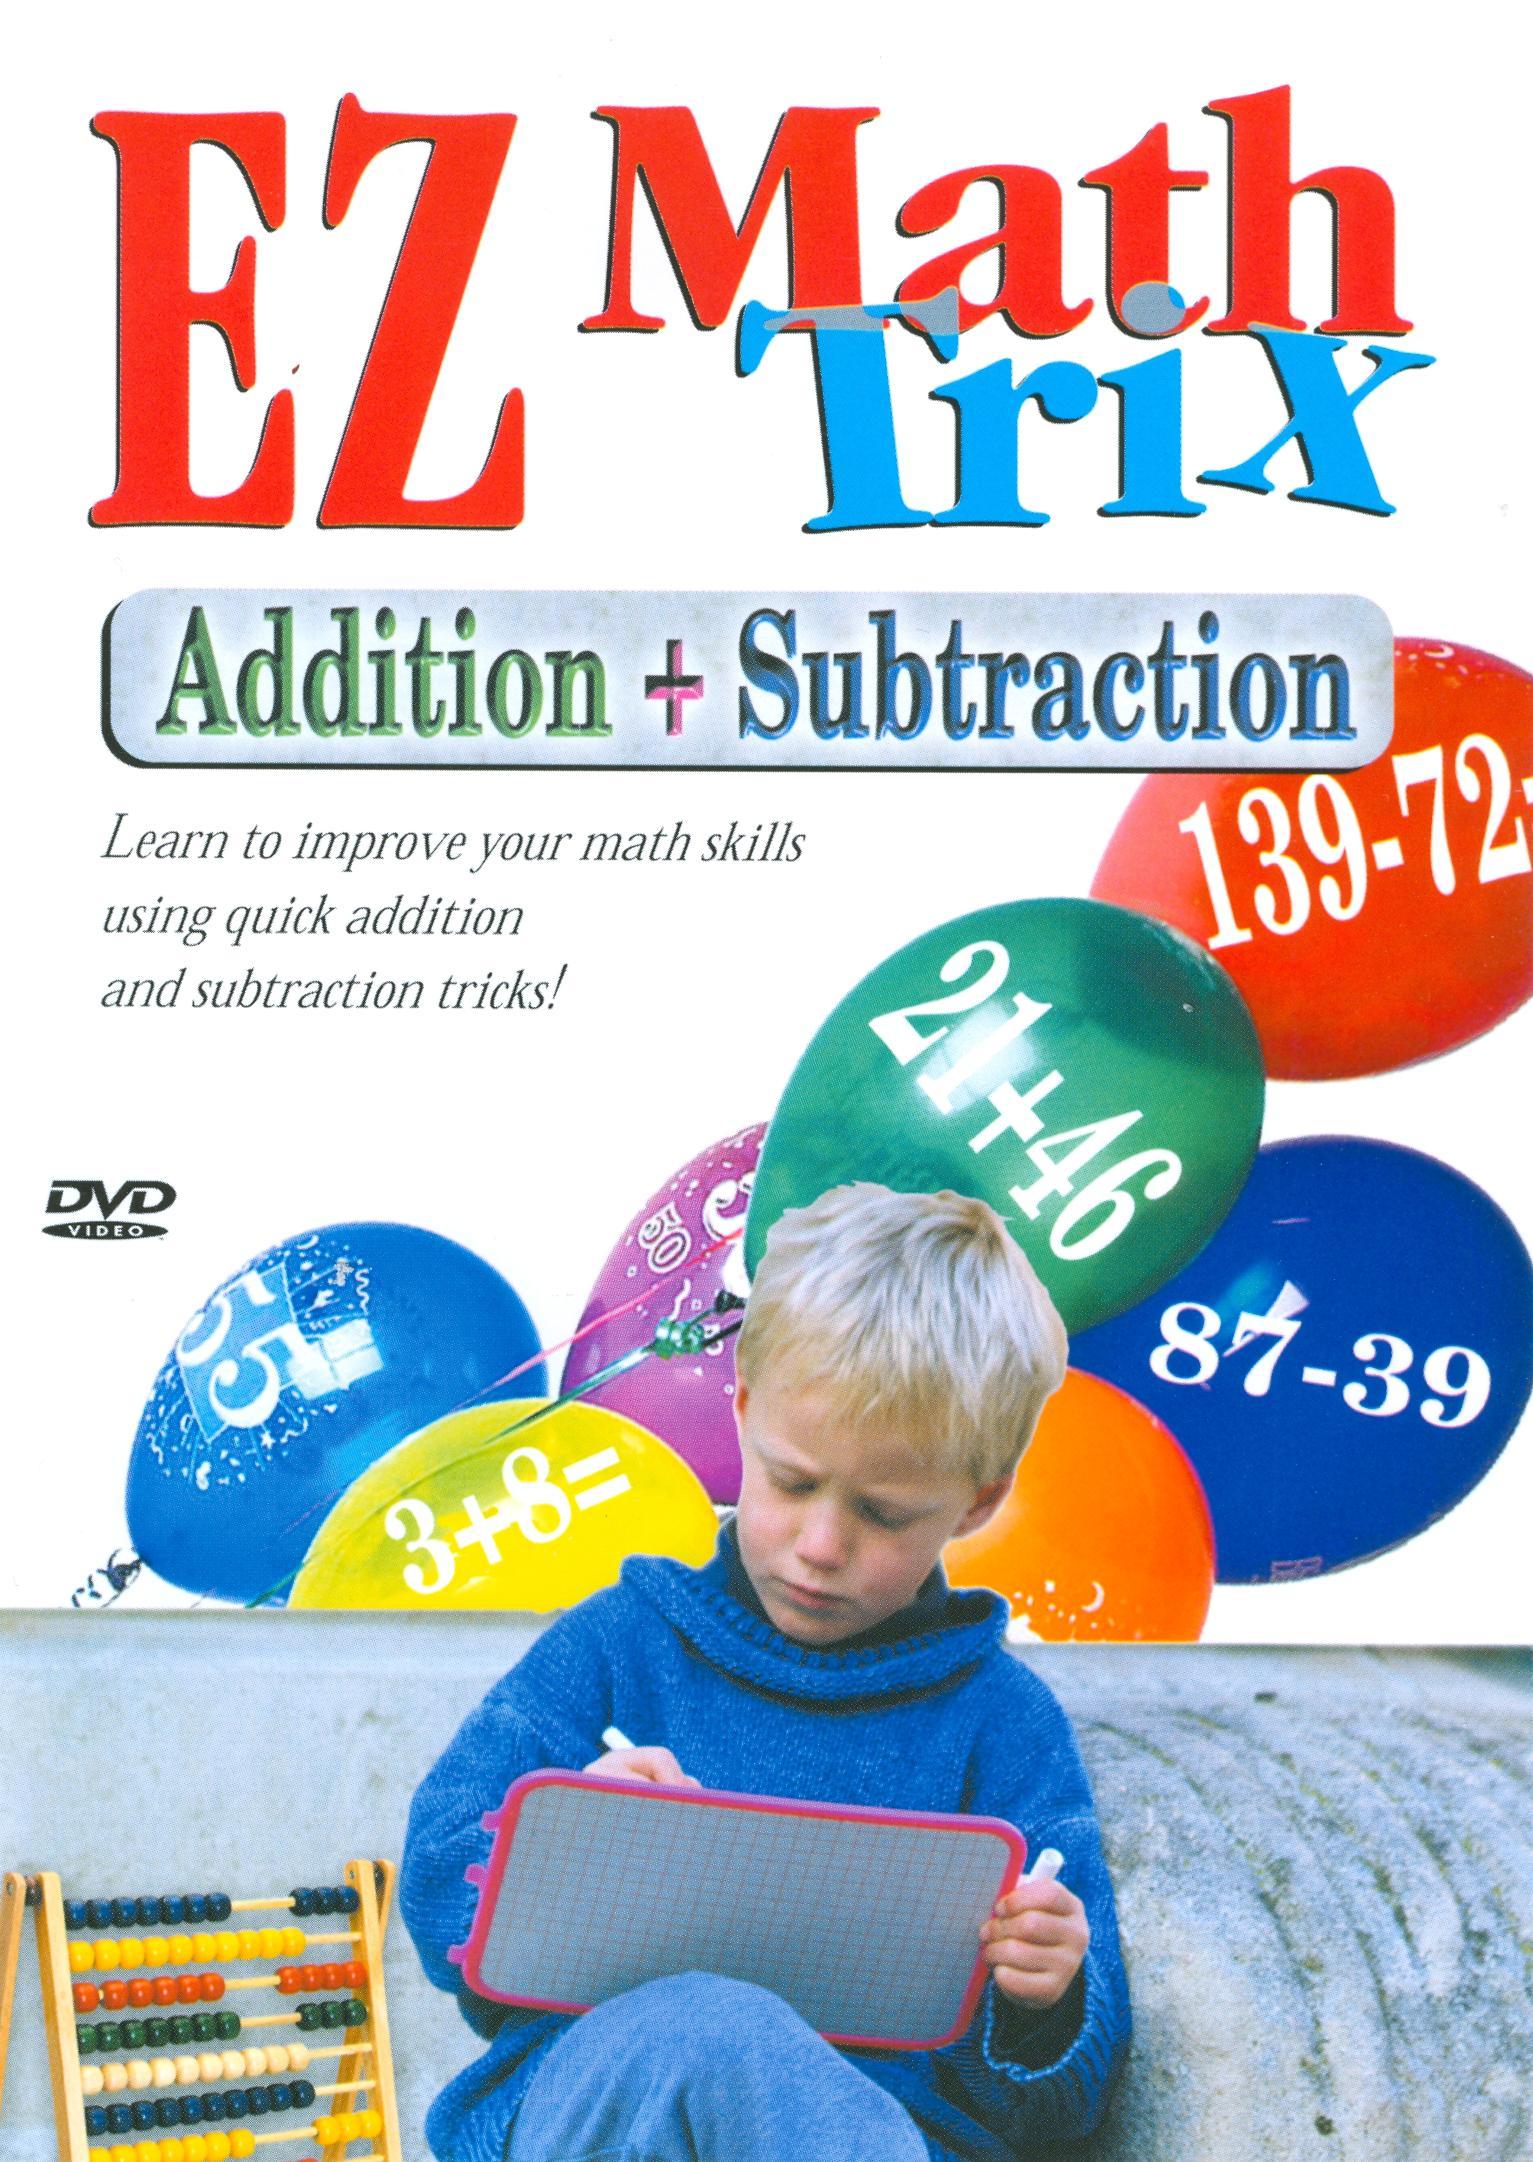 EZ Math Tricks: Addition and Subtraction